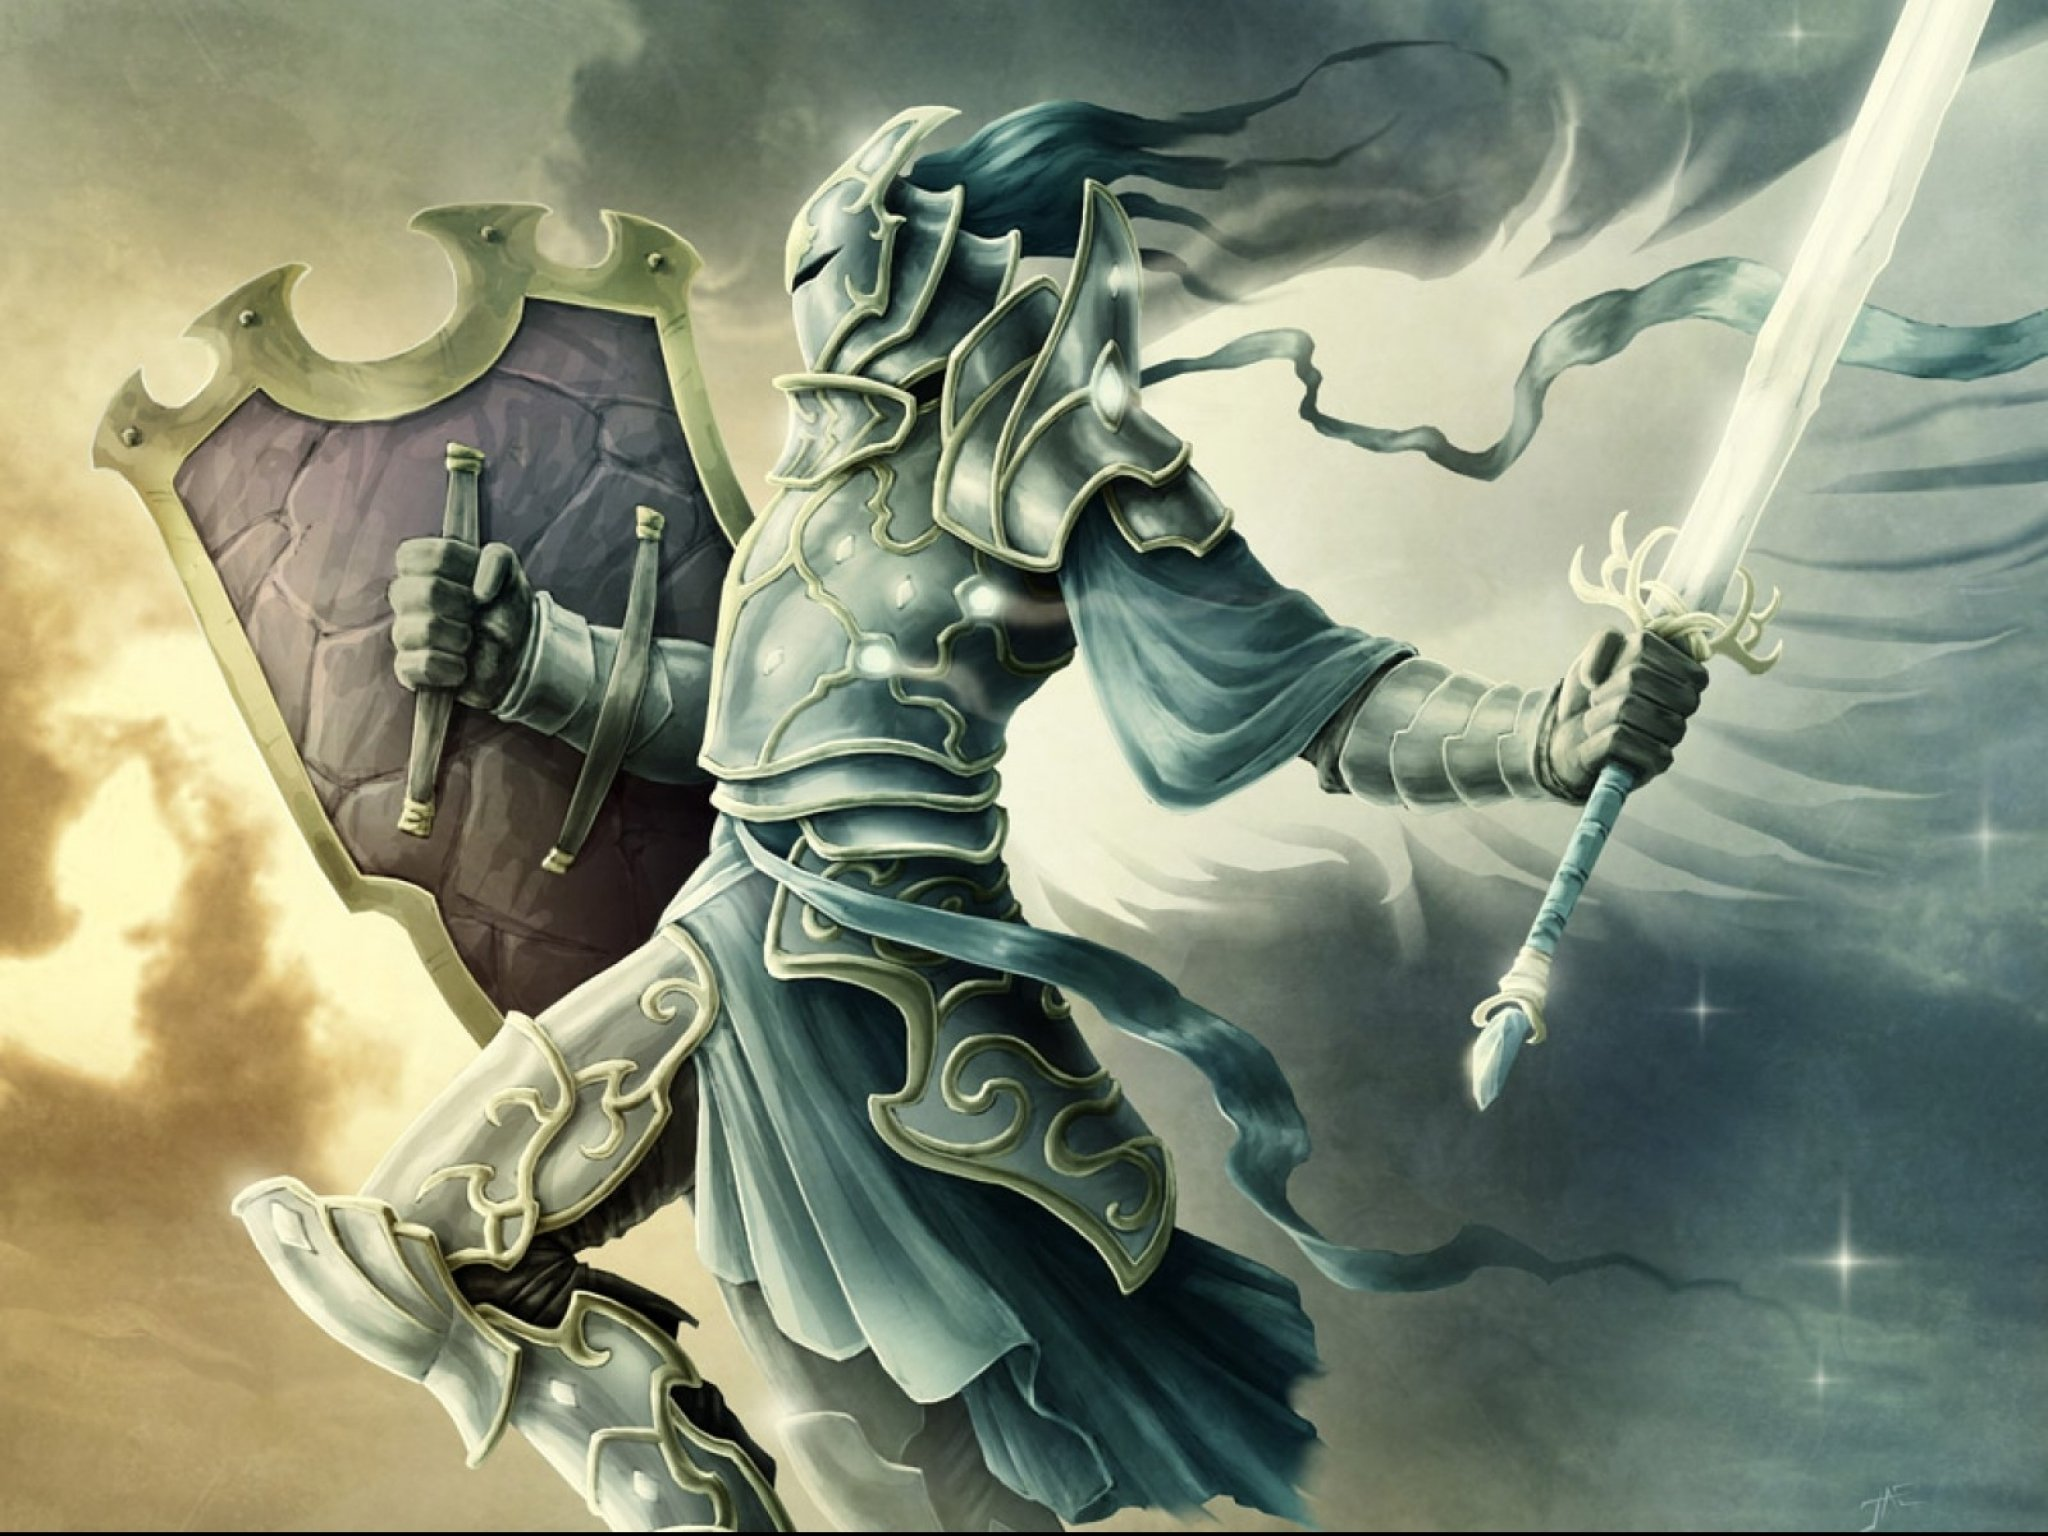 Fantasy angel warrior artwork art wallpaper | 2048x1536 ...